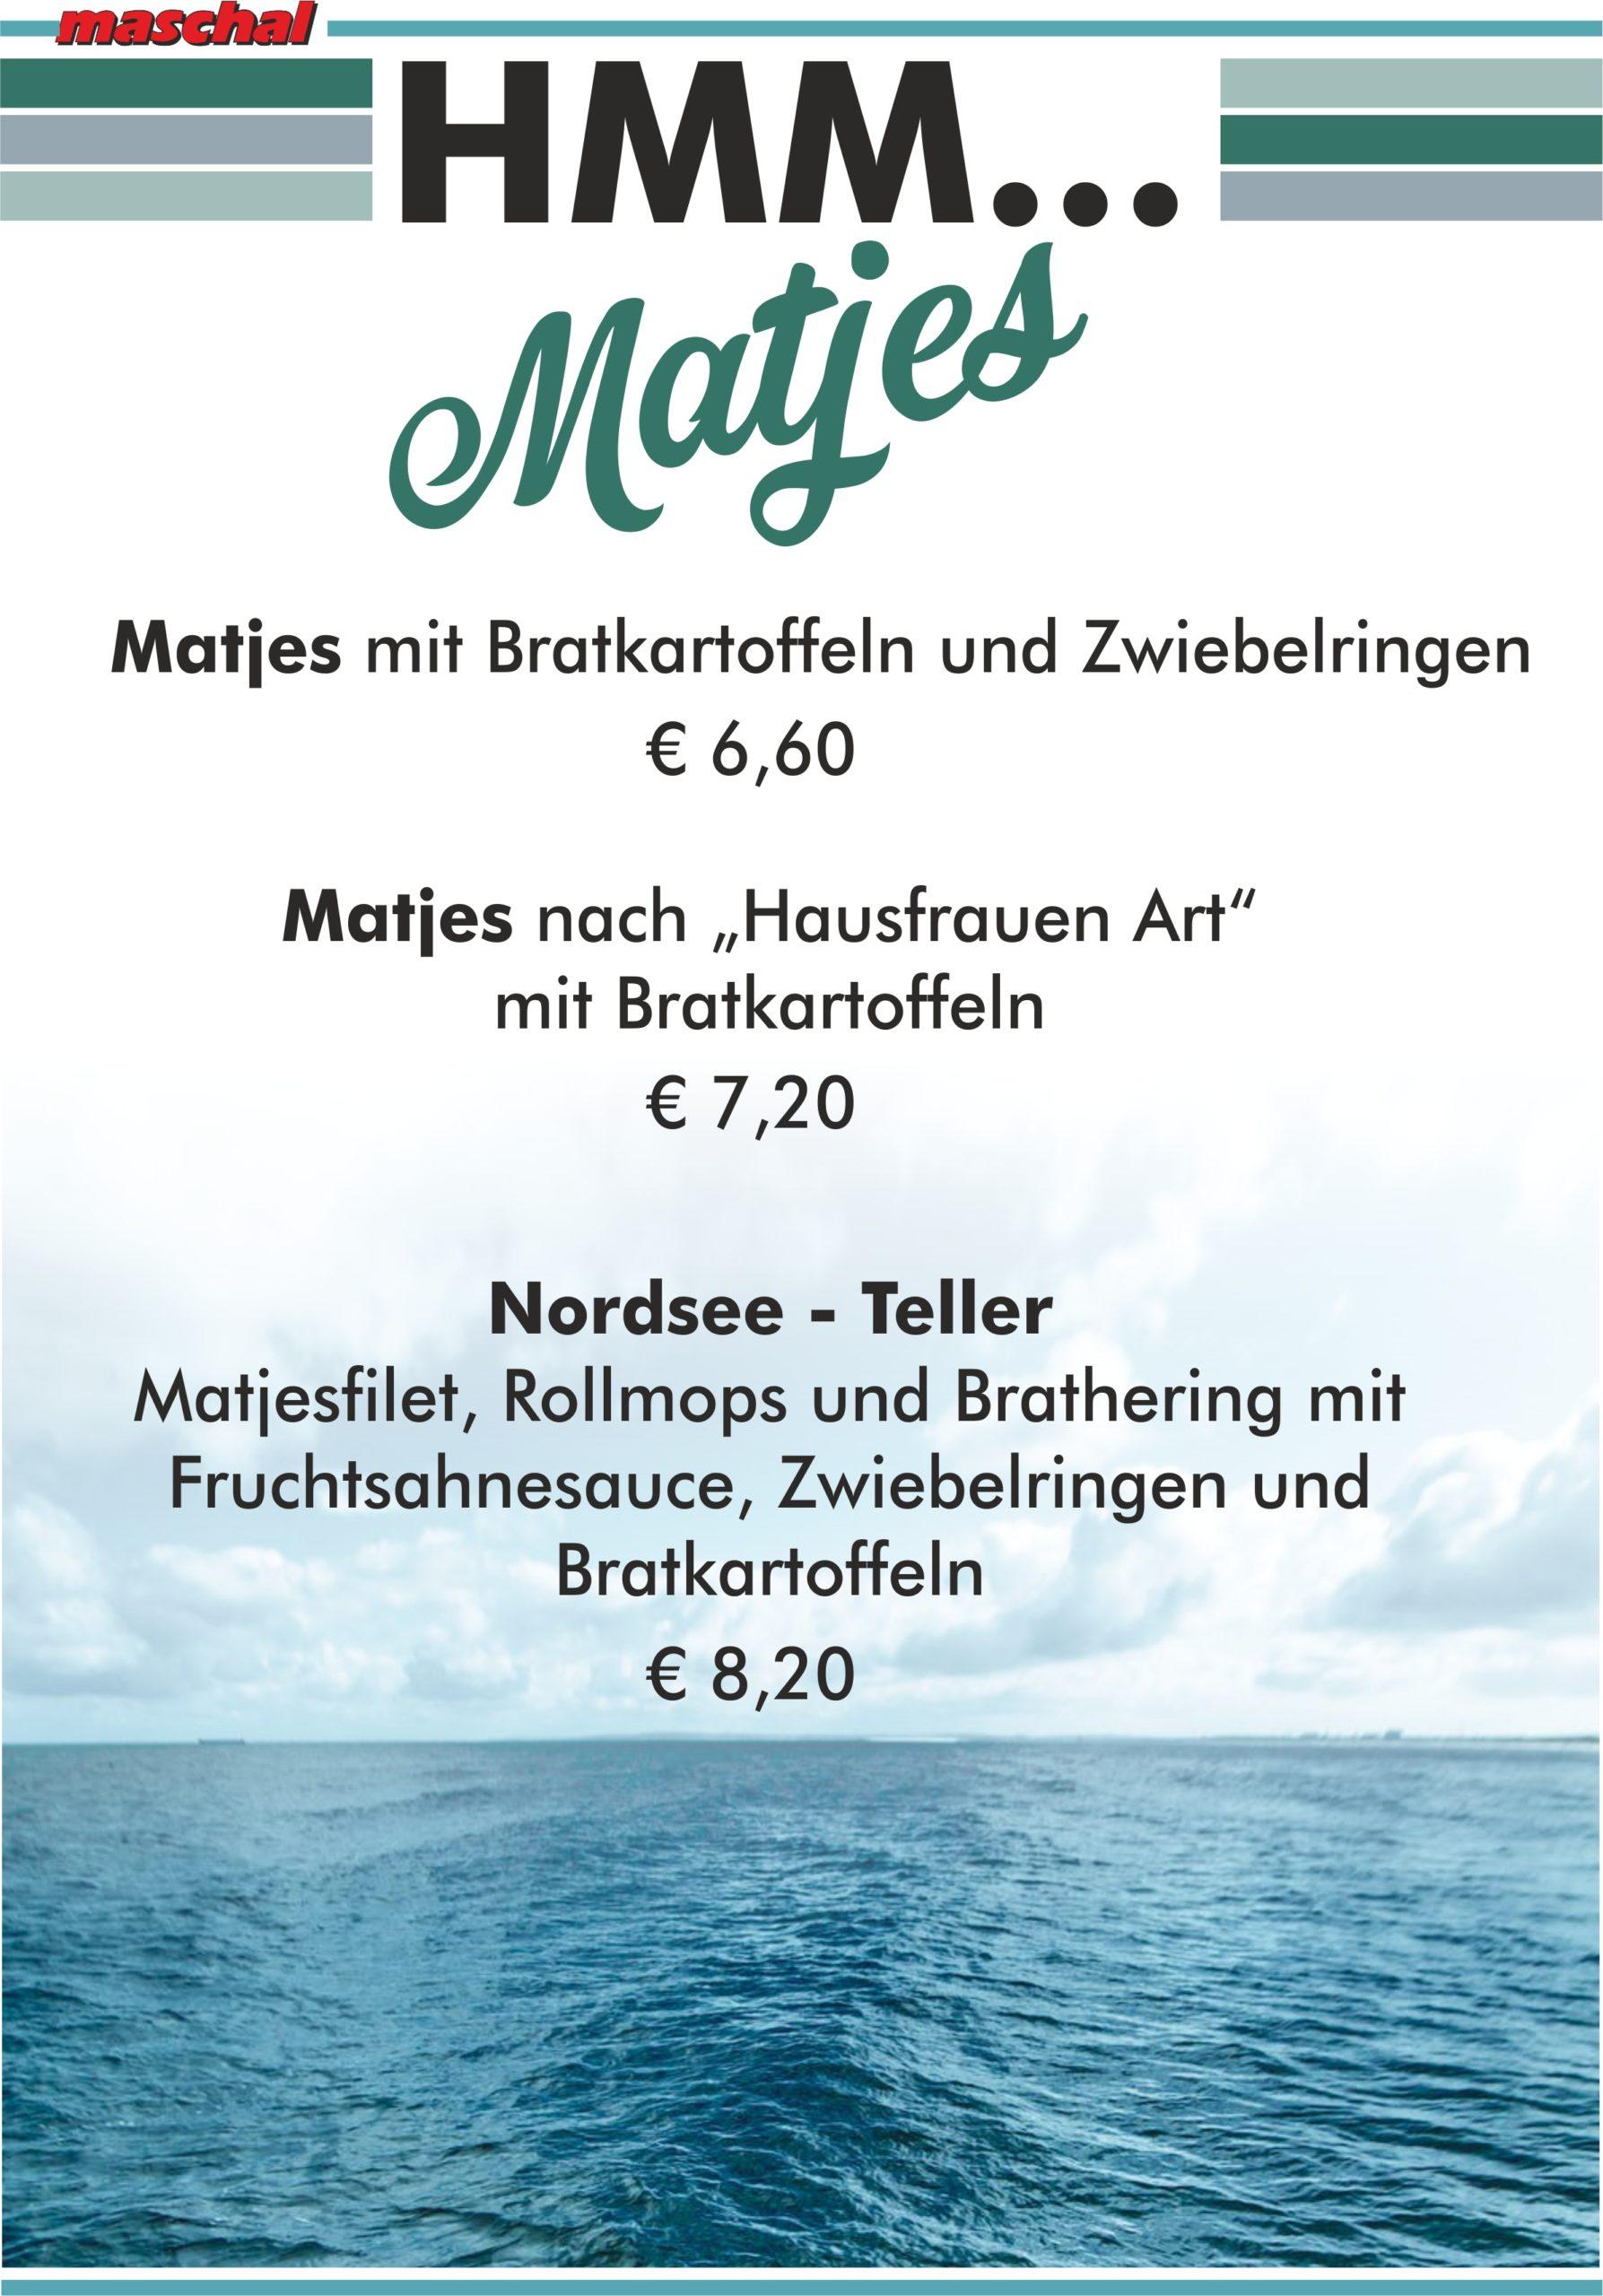 Matjes-Bistro-Karte-maschal-Varel-Wilhelmshaven-Oldenburg-Ostfriesland